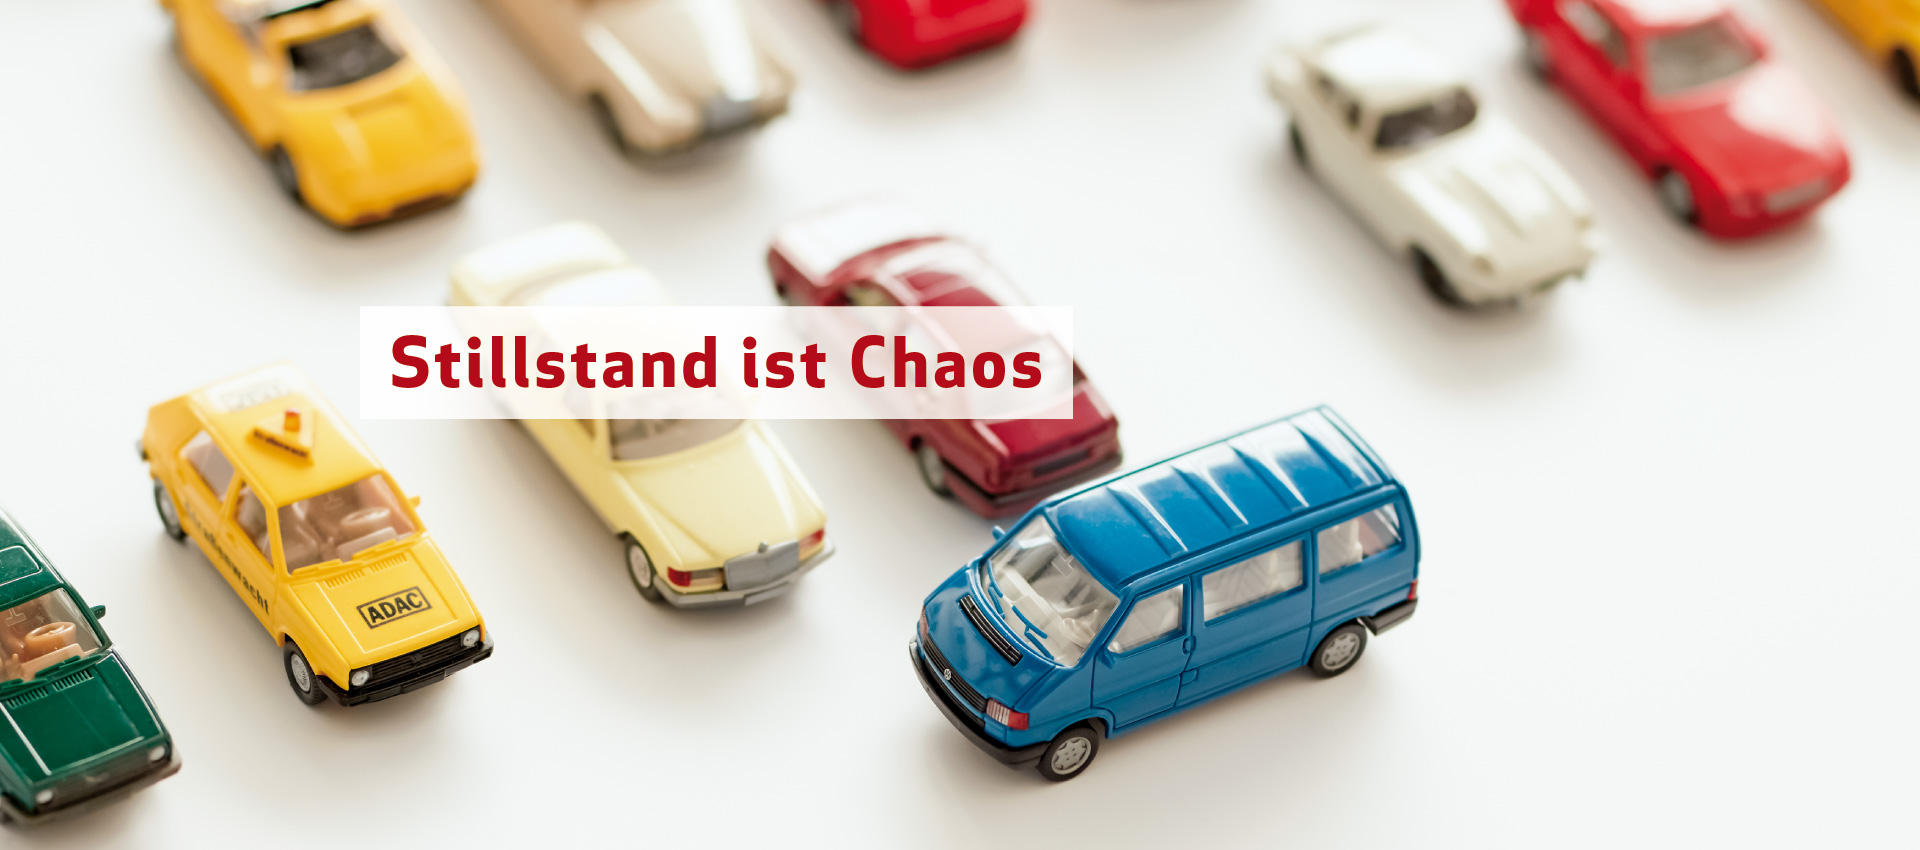 Stillstand ist Chaos